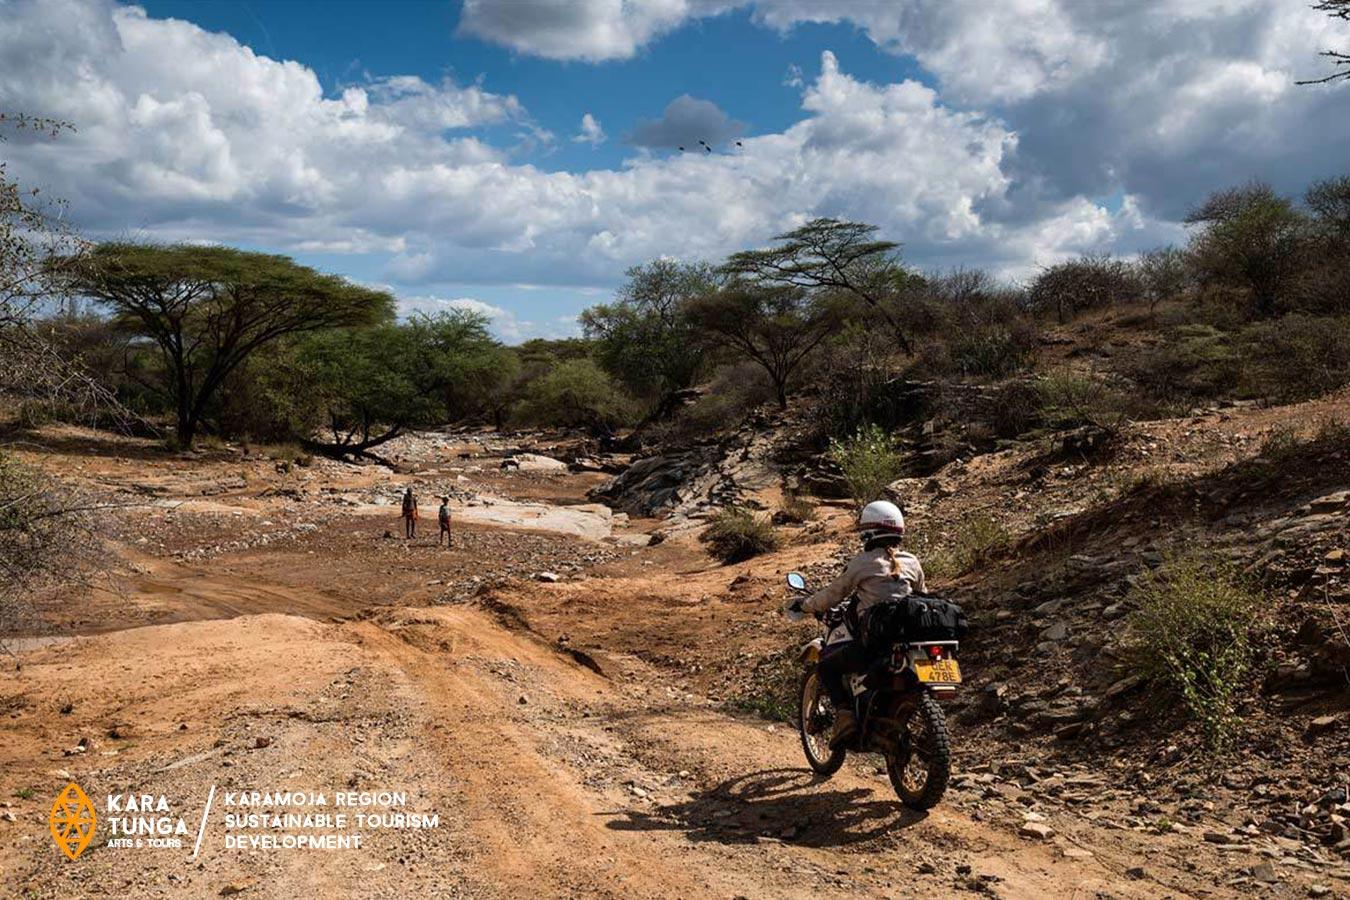 kara-tunga-turkana-motor-bike-tours-safaris-travel-culture-1